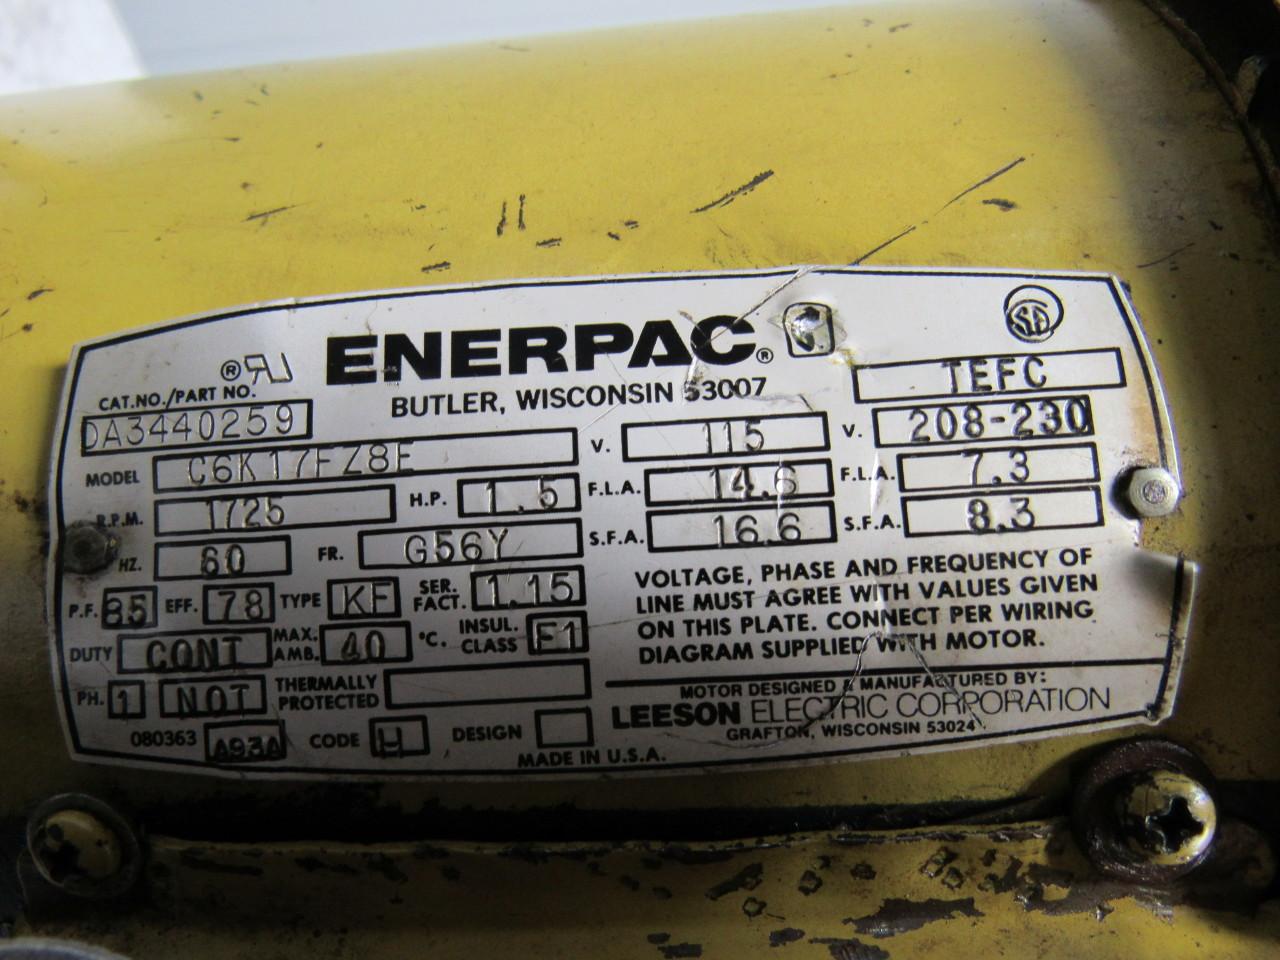 enerpac pemb submerged psi max electric hydraulic electric hydraulic pump 1phase acircmiddot enerpac pem3602b 30000 submerged 10 000psi max electric hydraulic pump 1phase